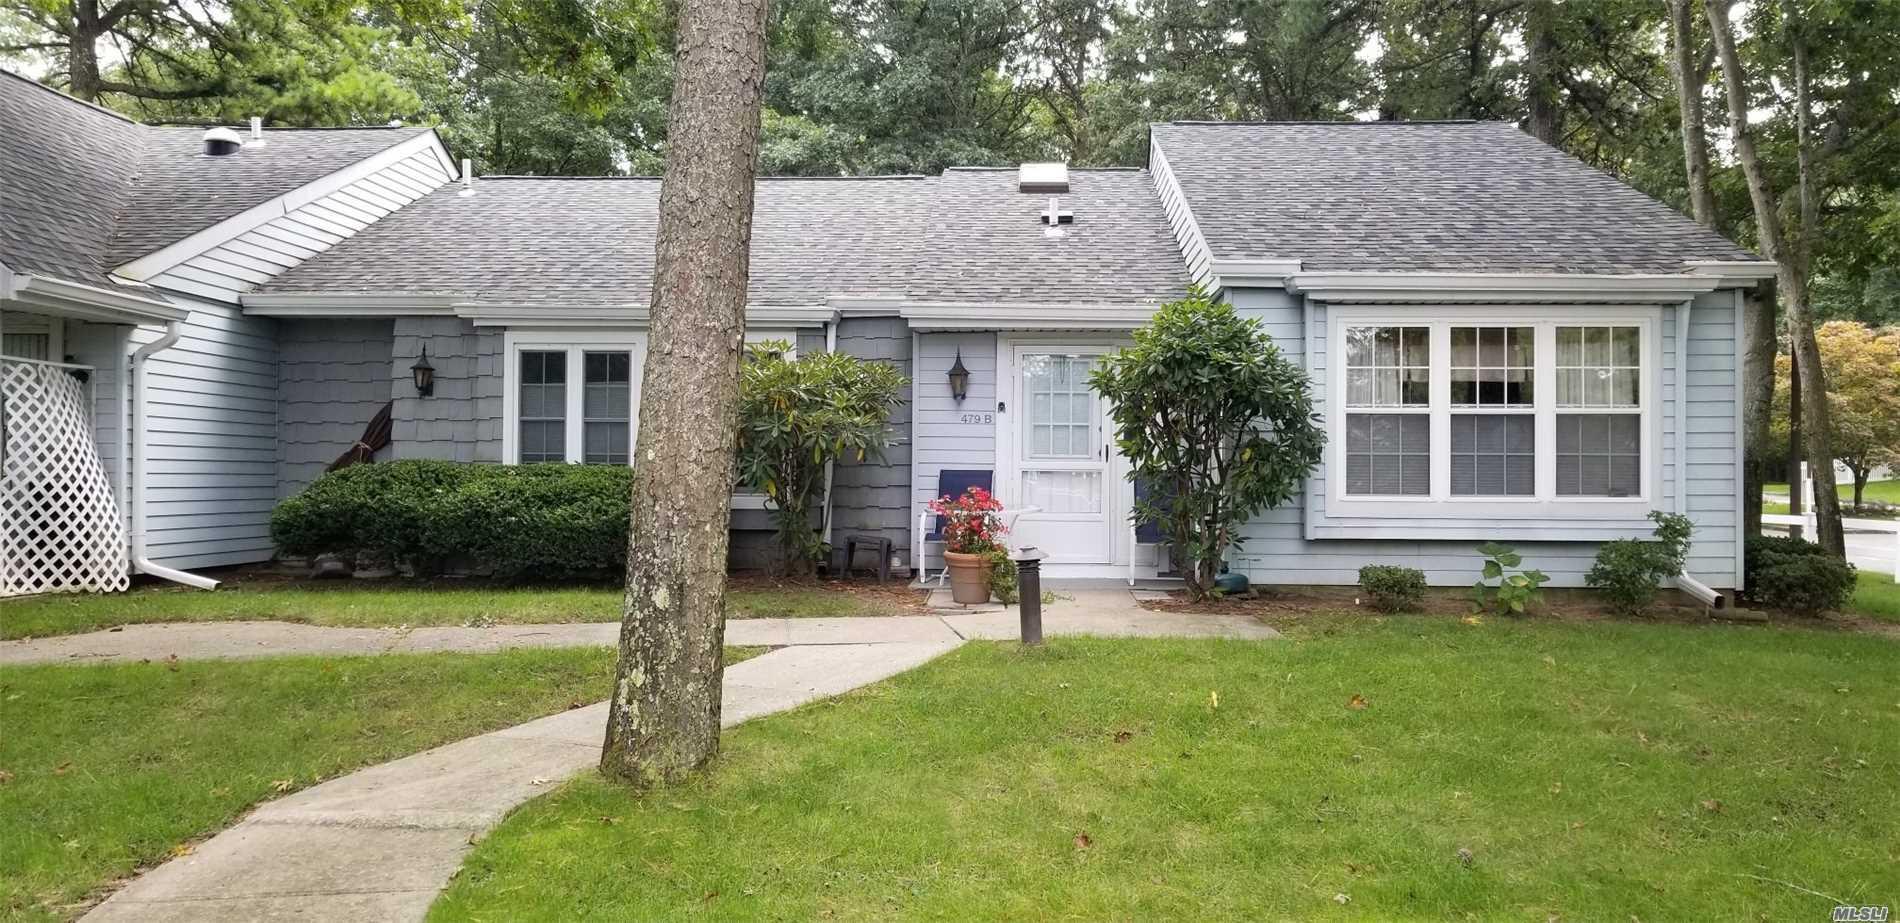 Property for sale at 479 B Fairway Ct, Ridge,  NY 11961